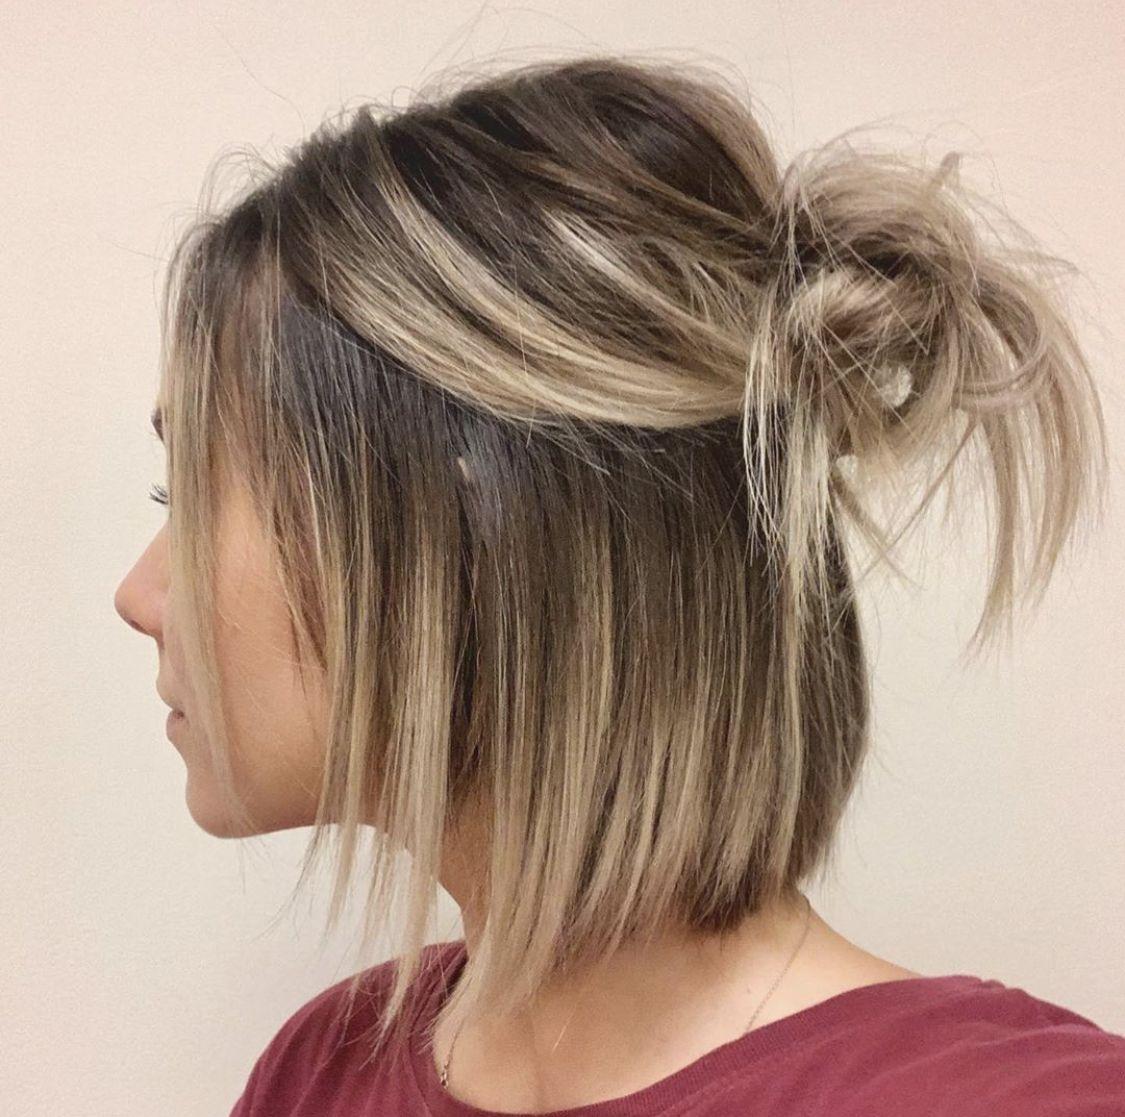 Pin By Sarah Tester On Hair Trendy Short Hair Styles Short Hair Trends Medium Hair Styles